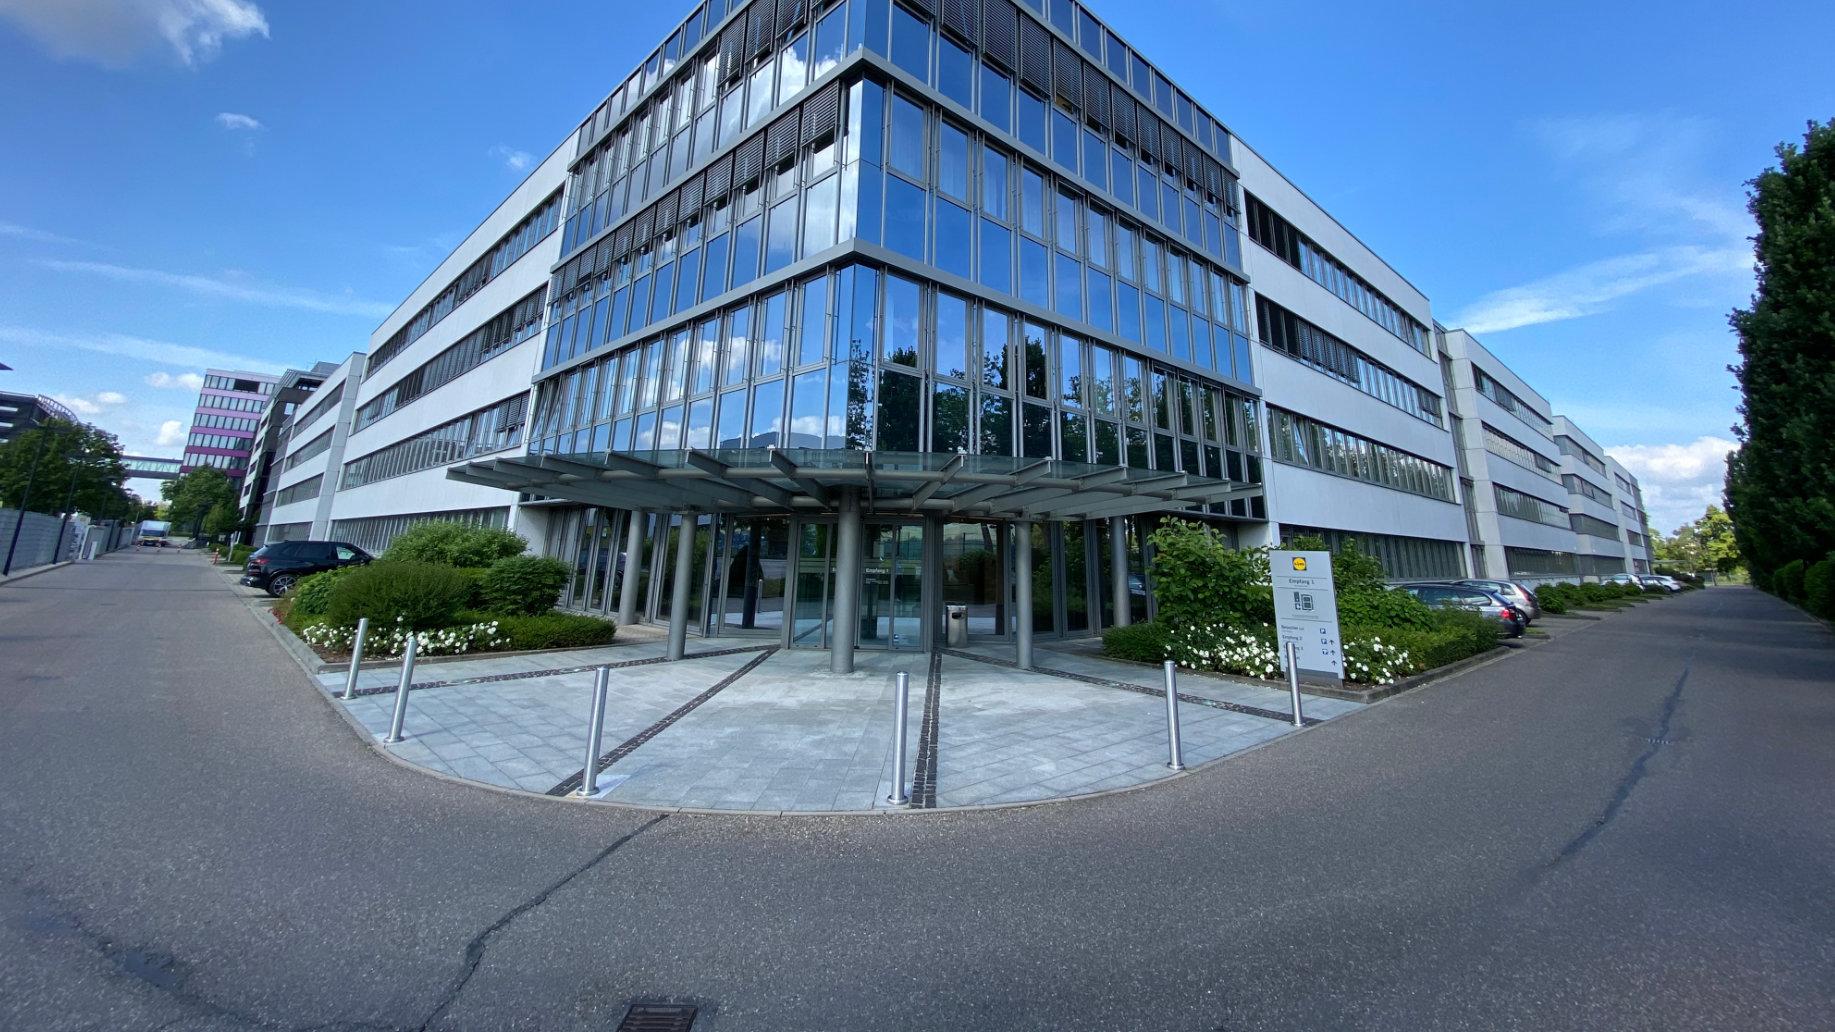 Lidl Gebäude in Neckarsulm